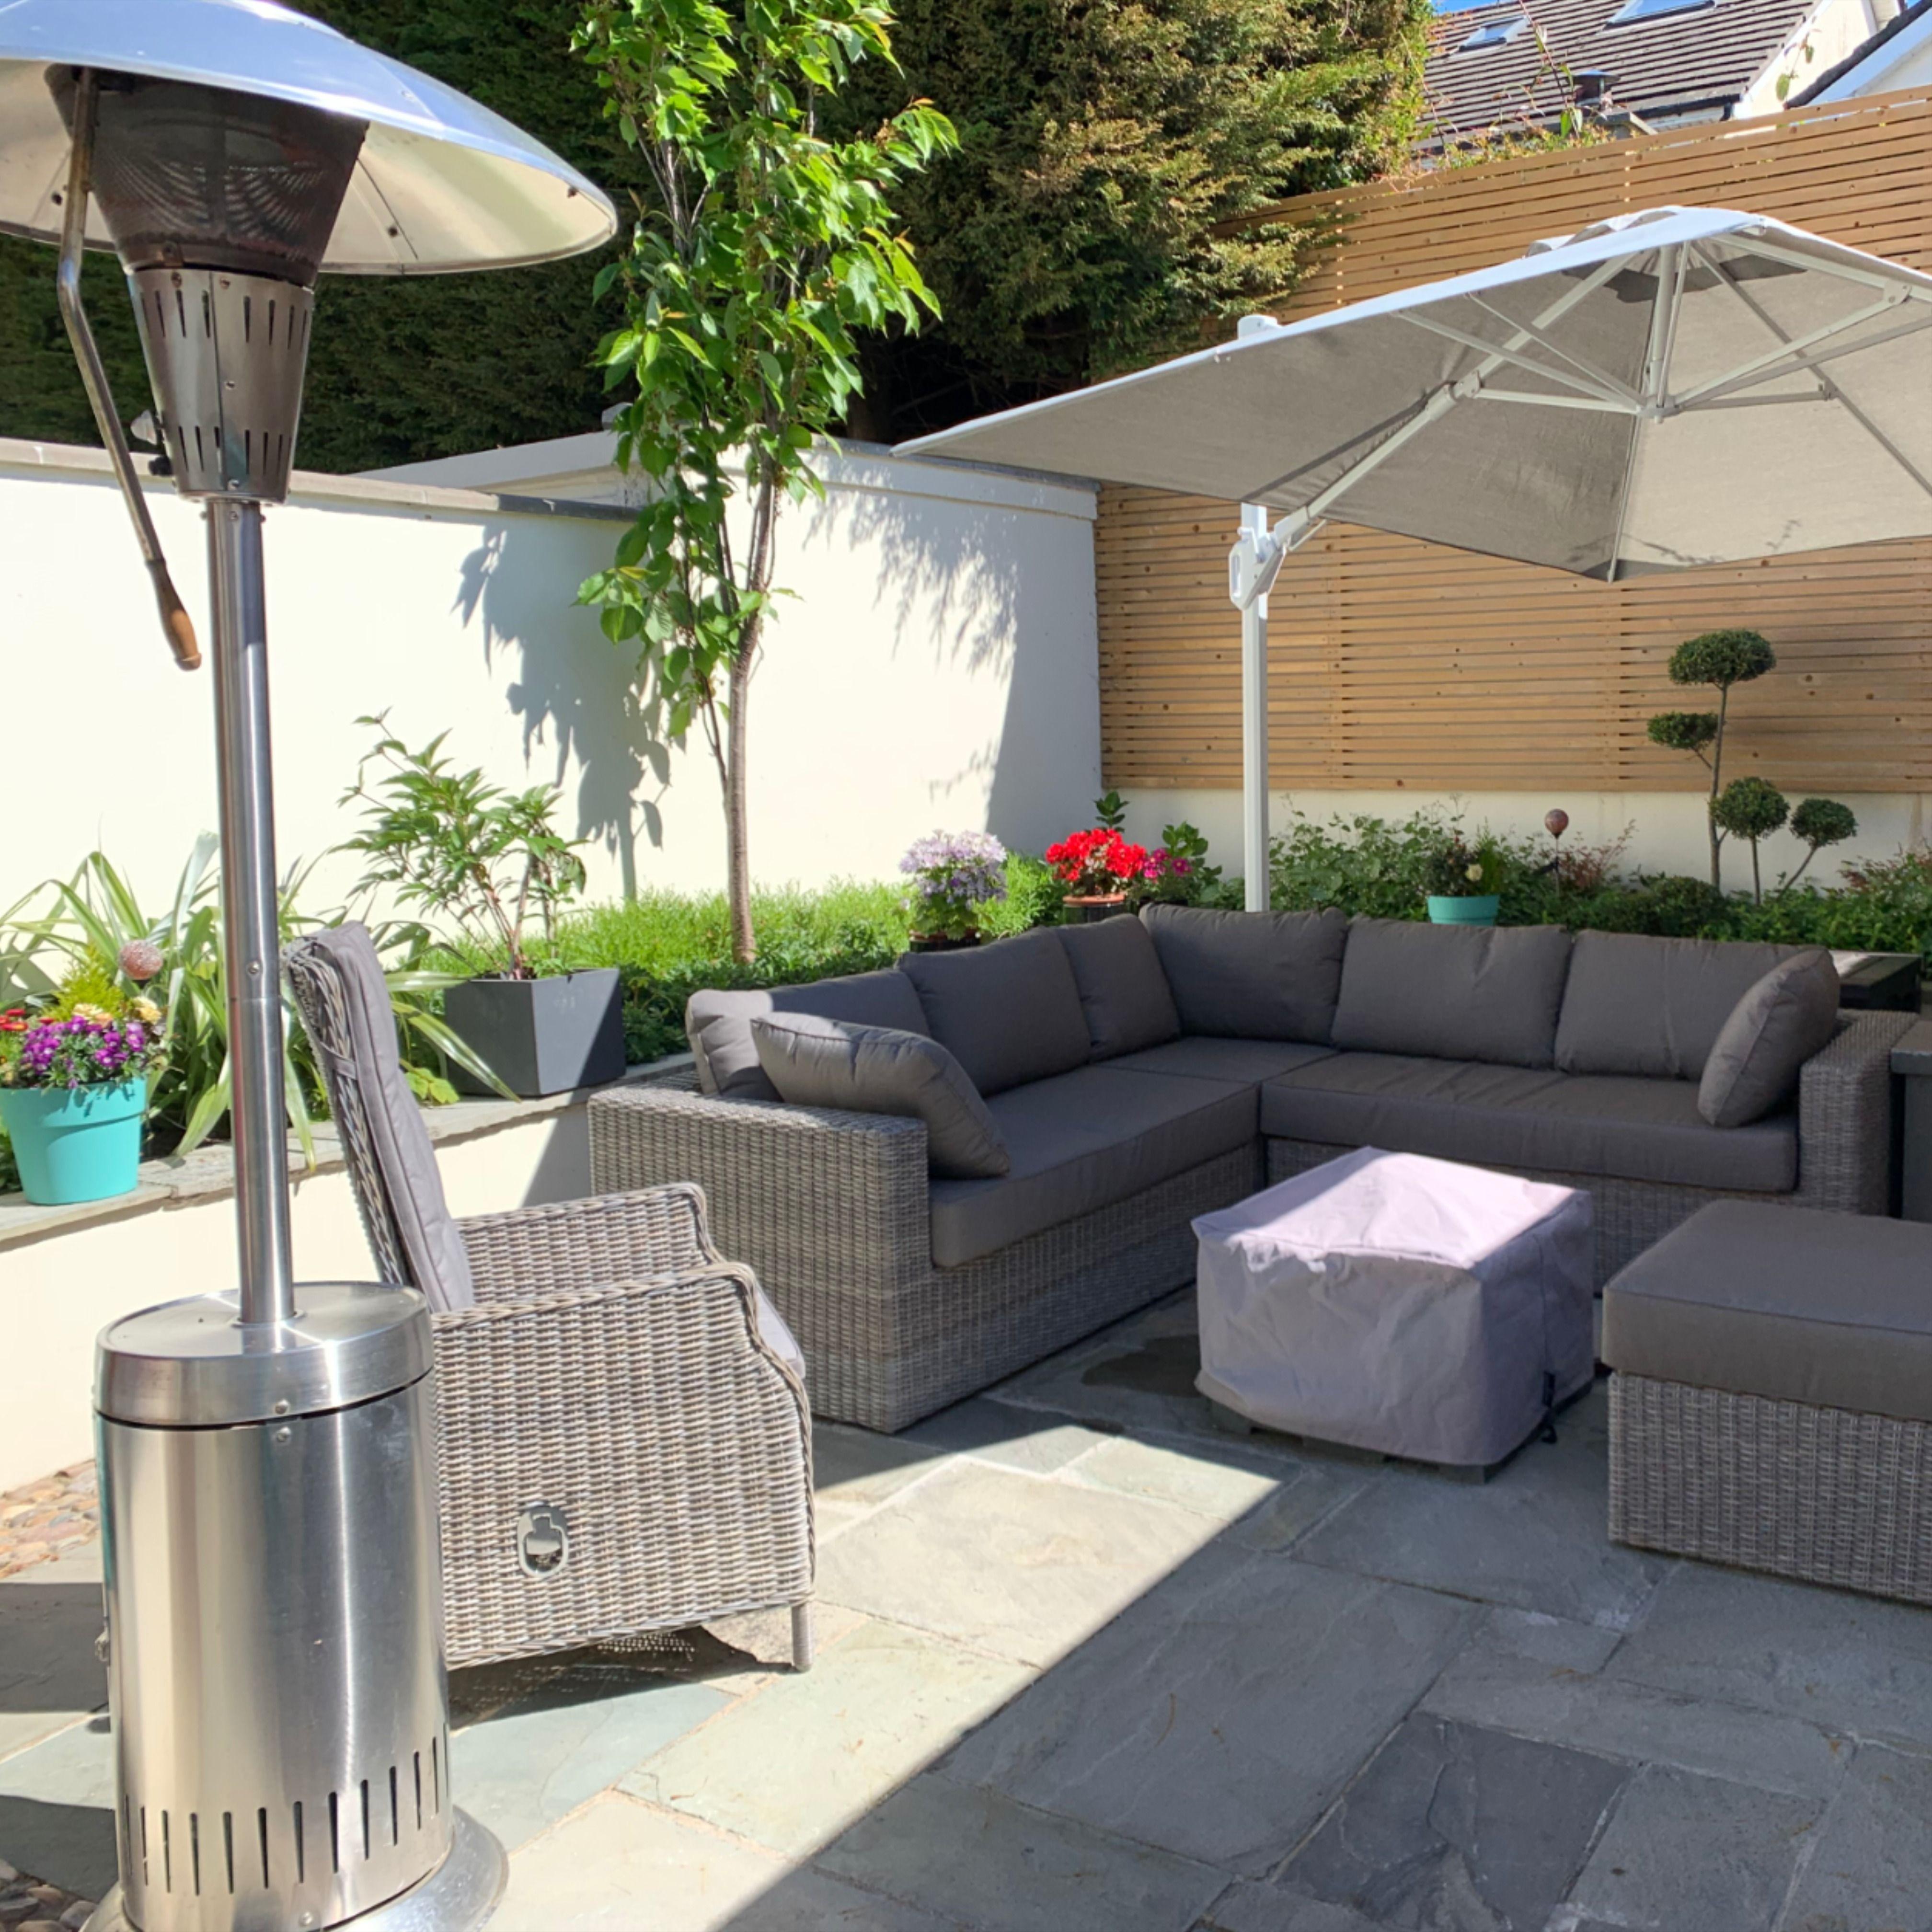 Stunning Irish Patio In 2020 Patio Garden Furniture Ireland Outdoor Heating